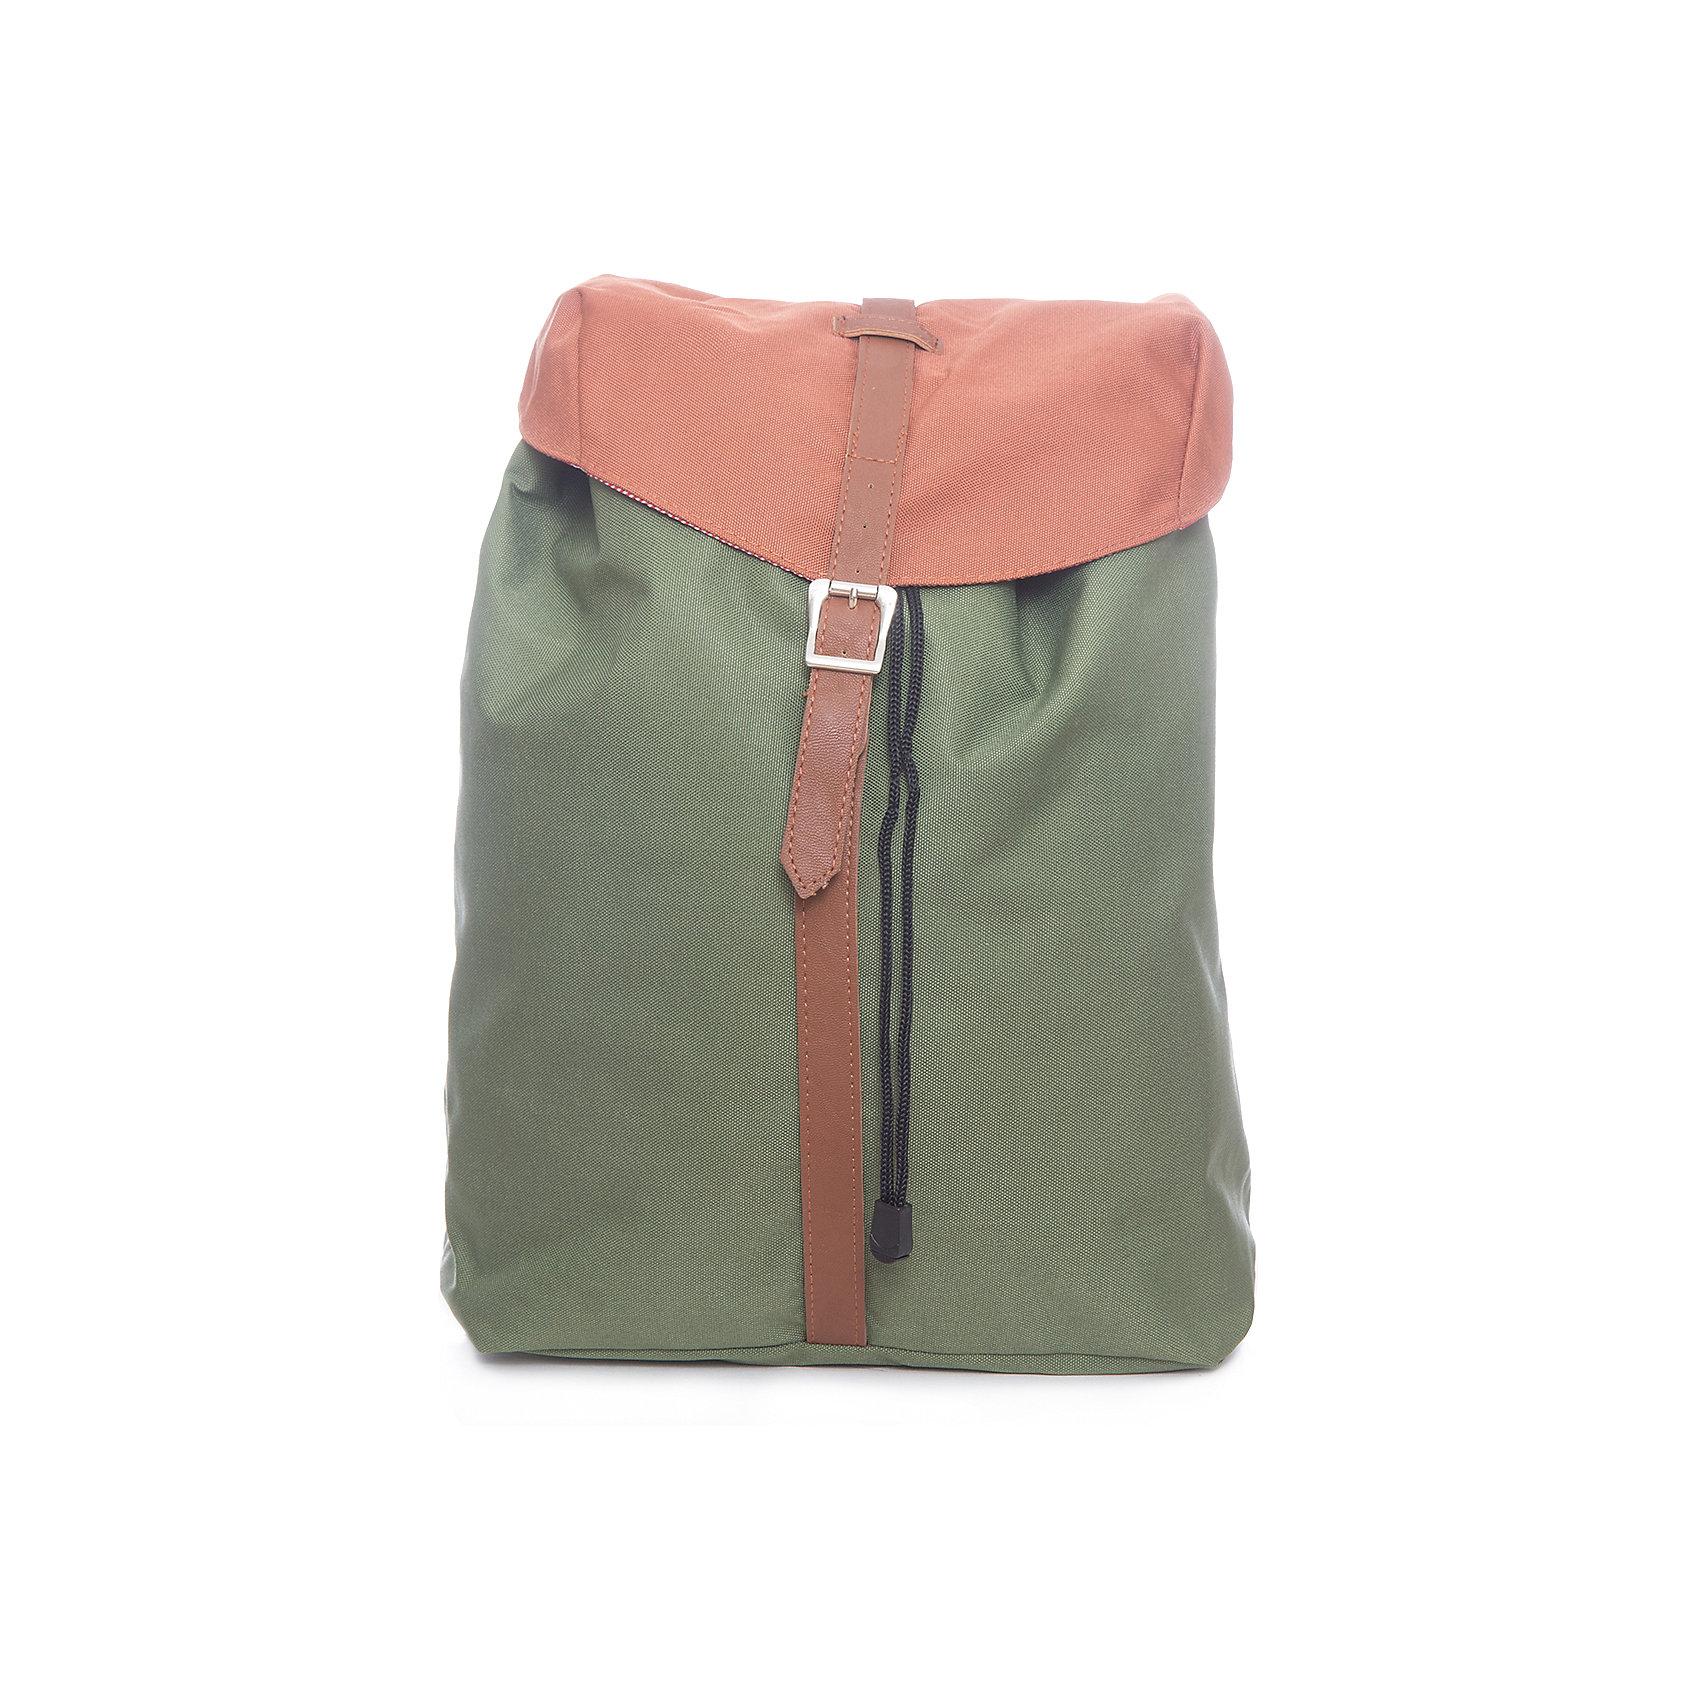 Феникс+ Рюкзак молодежный, зеленый рюкзаки феникс феникс 43654 рюкзак молодежный хаки 29х13х44см